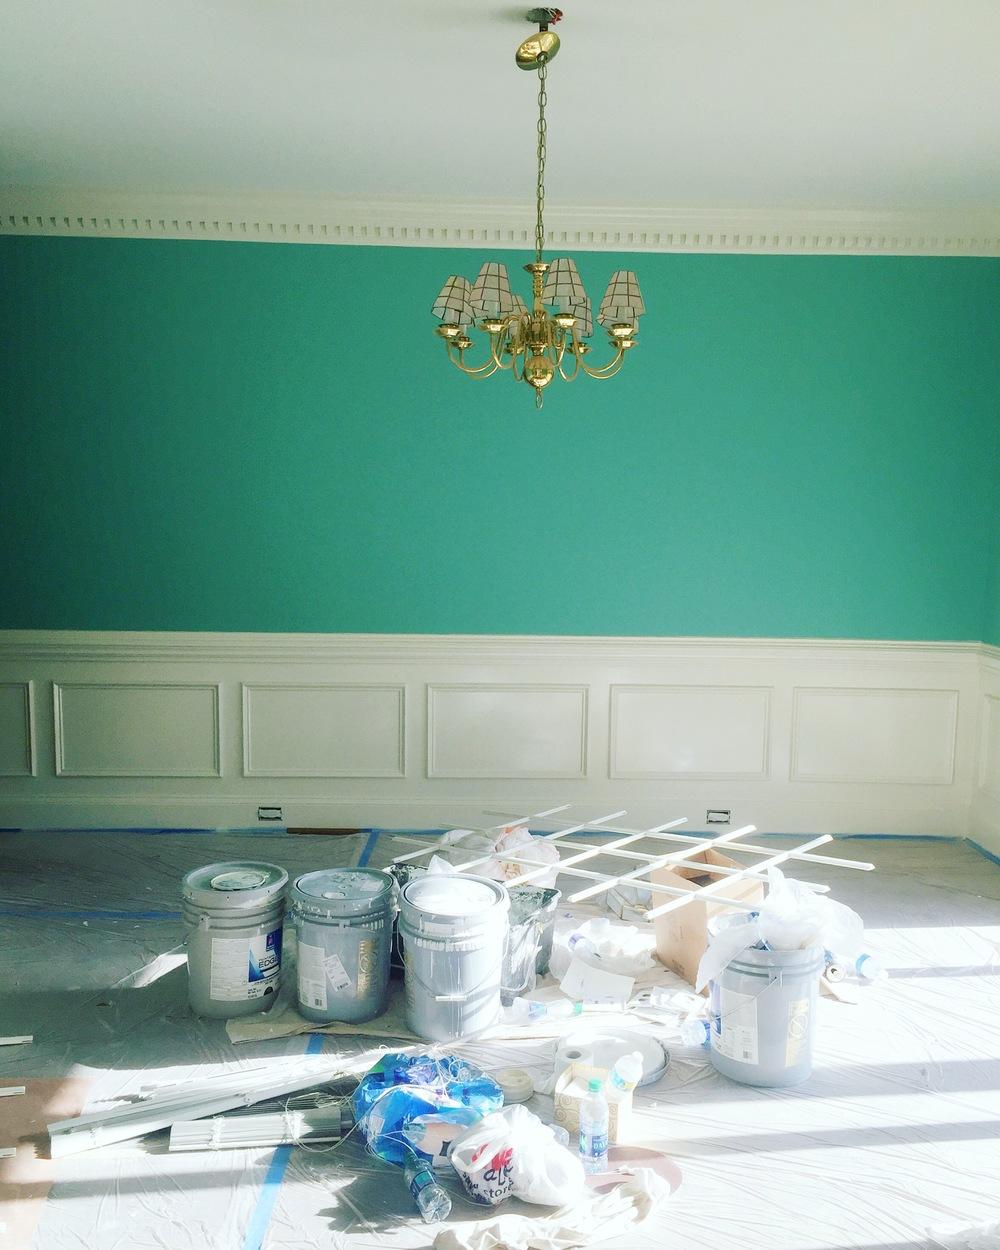 Dining room getting a fresh coat of sea foam green.